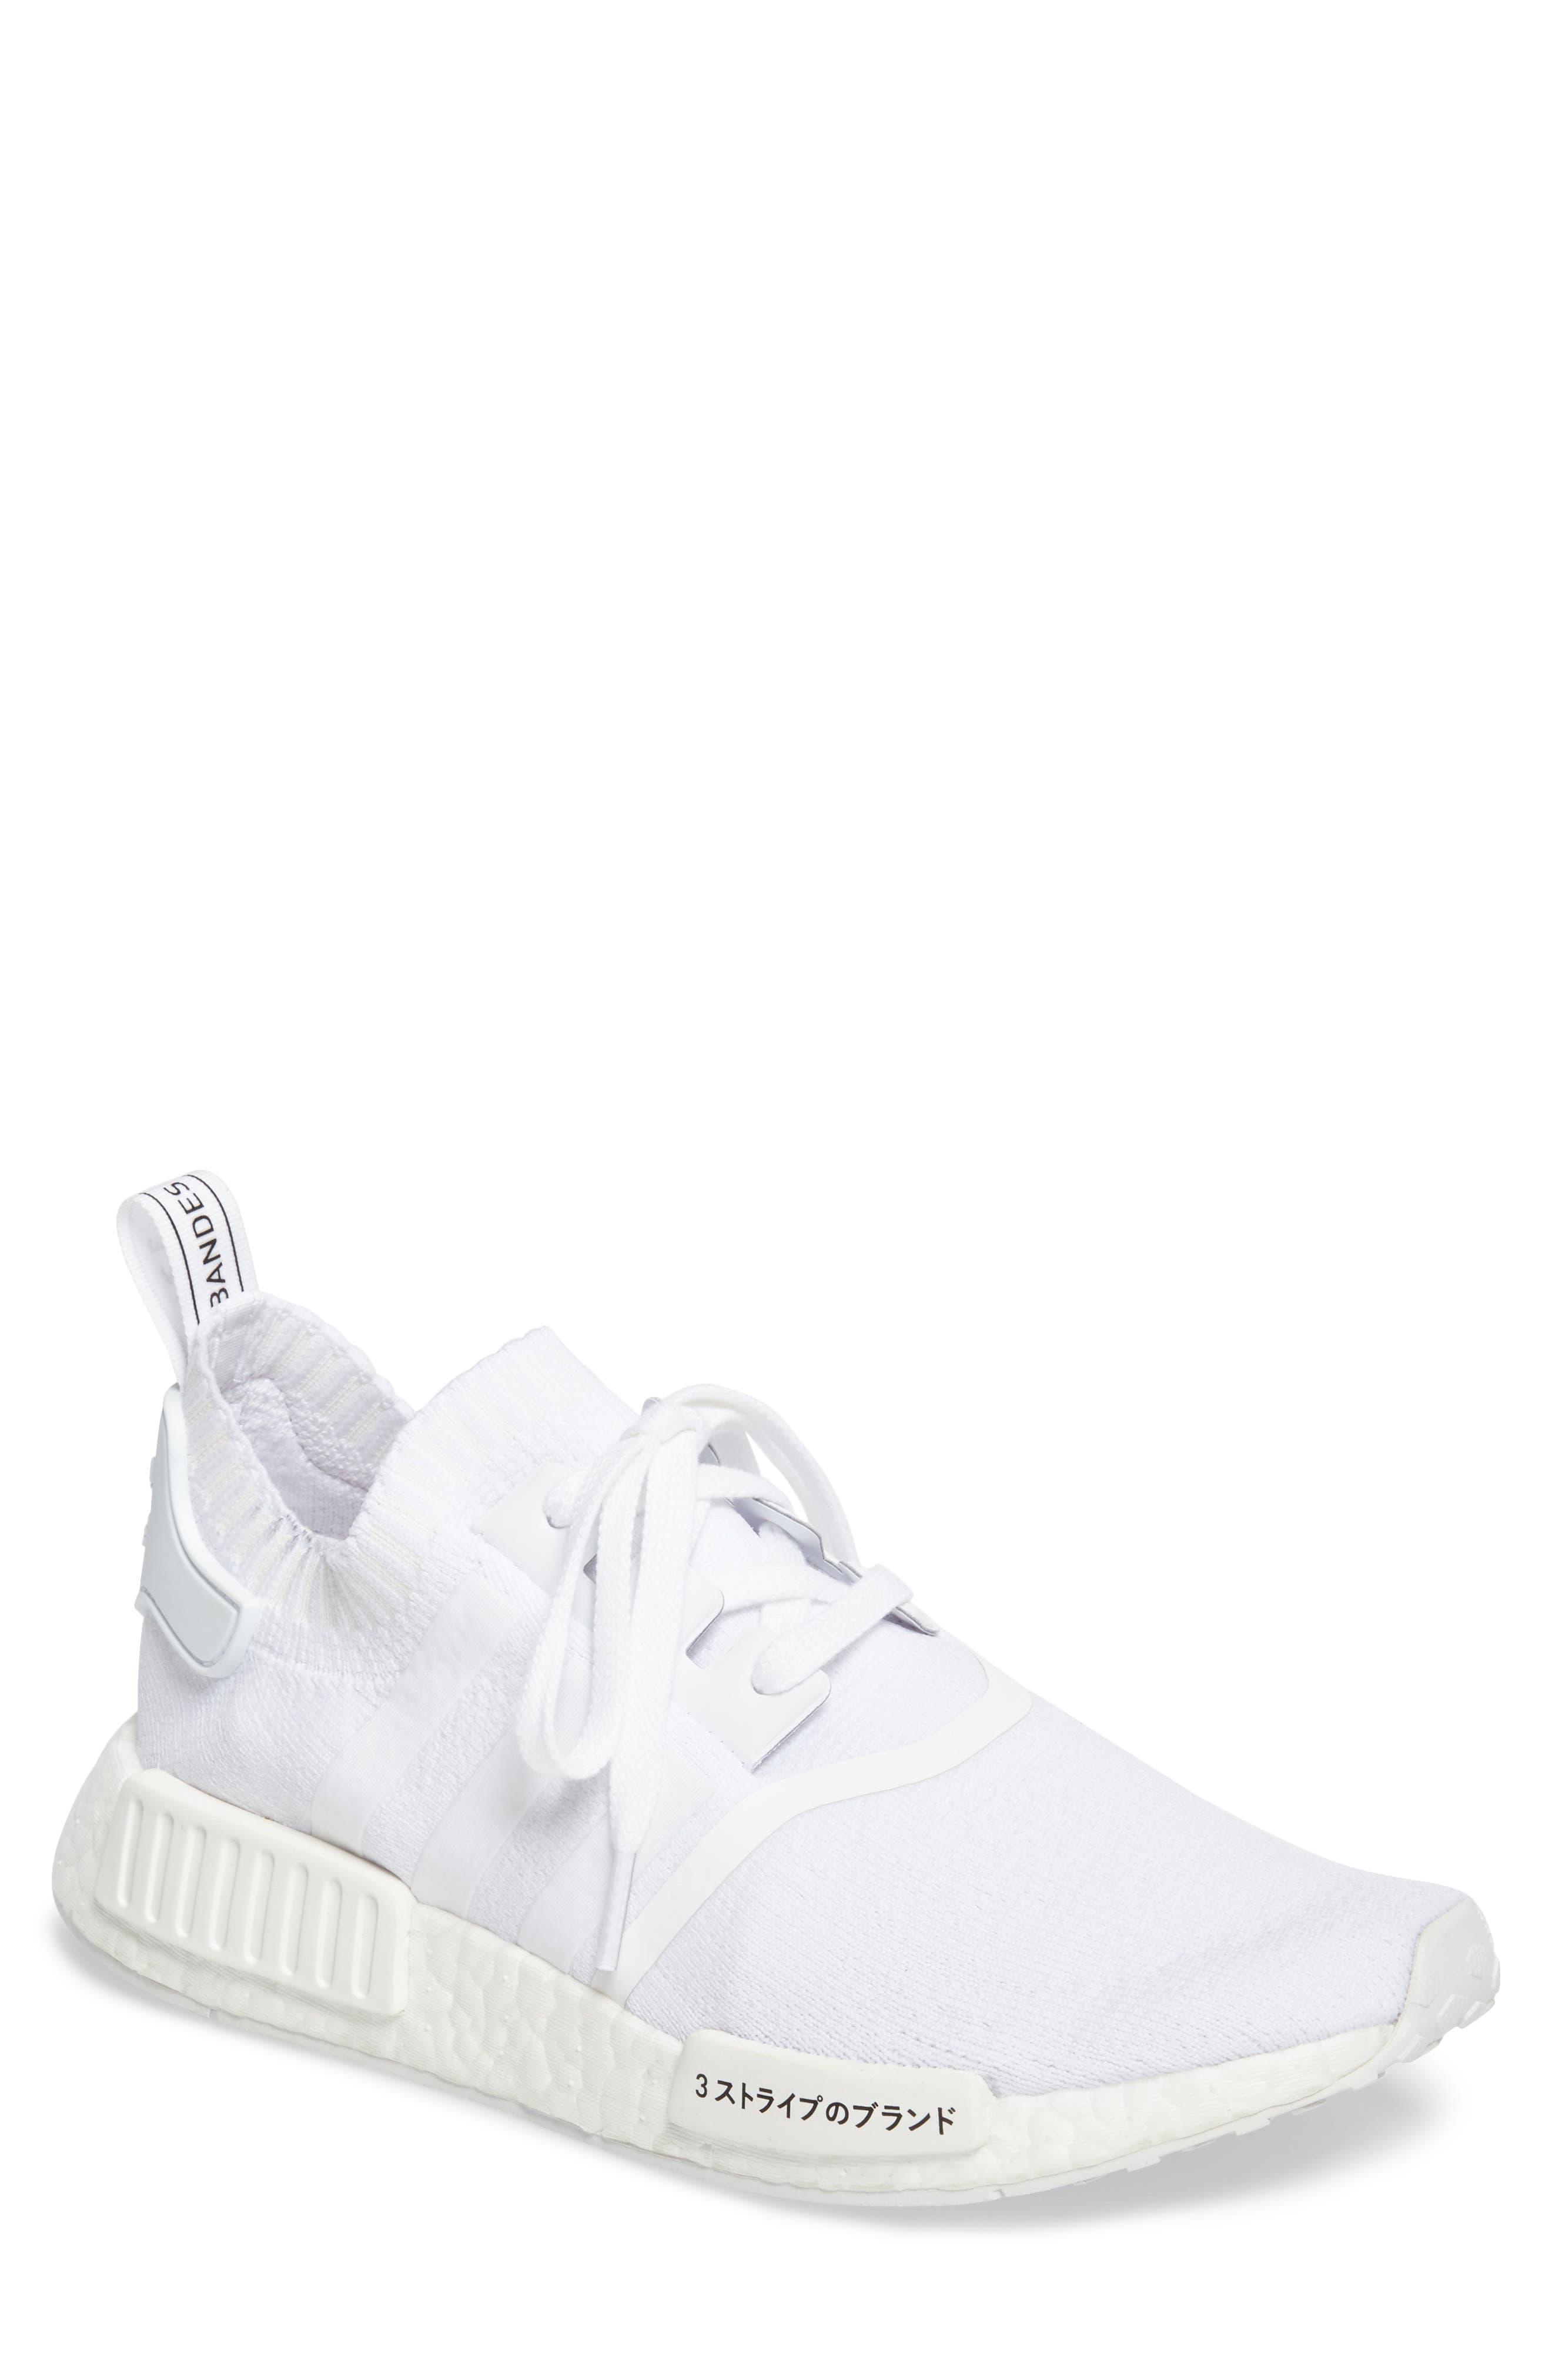 adidas NMD R1 Primeknit Sneaker (Men)